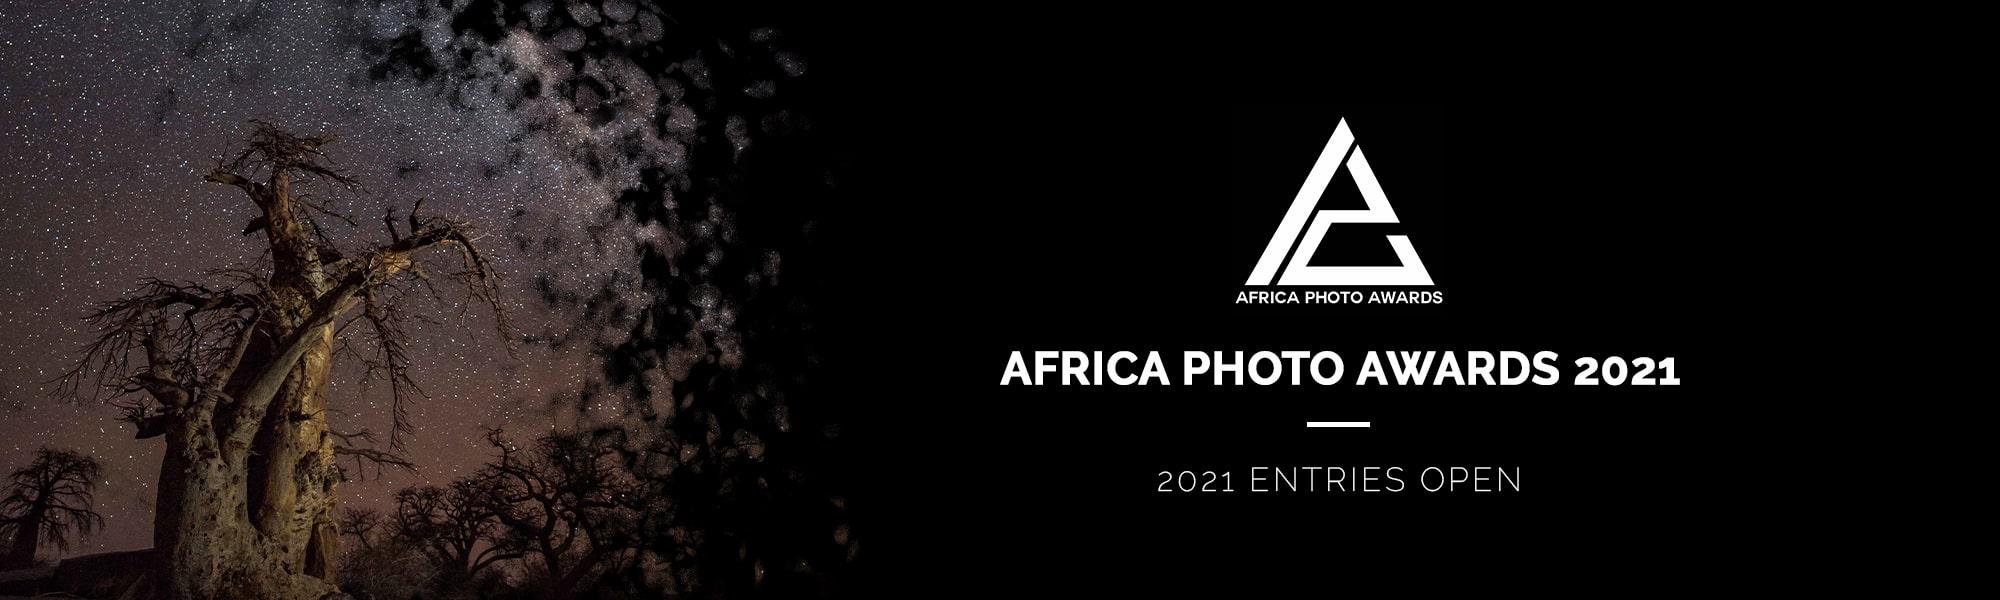 African Photo Awards